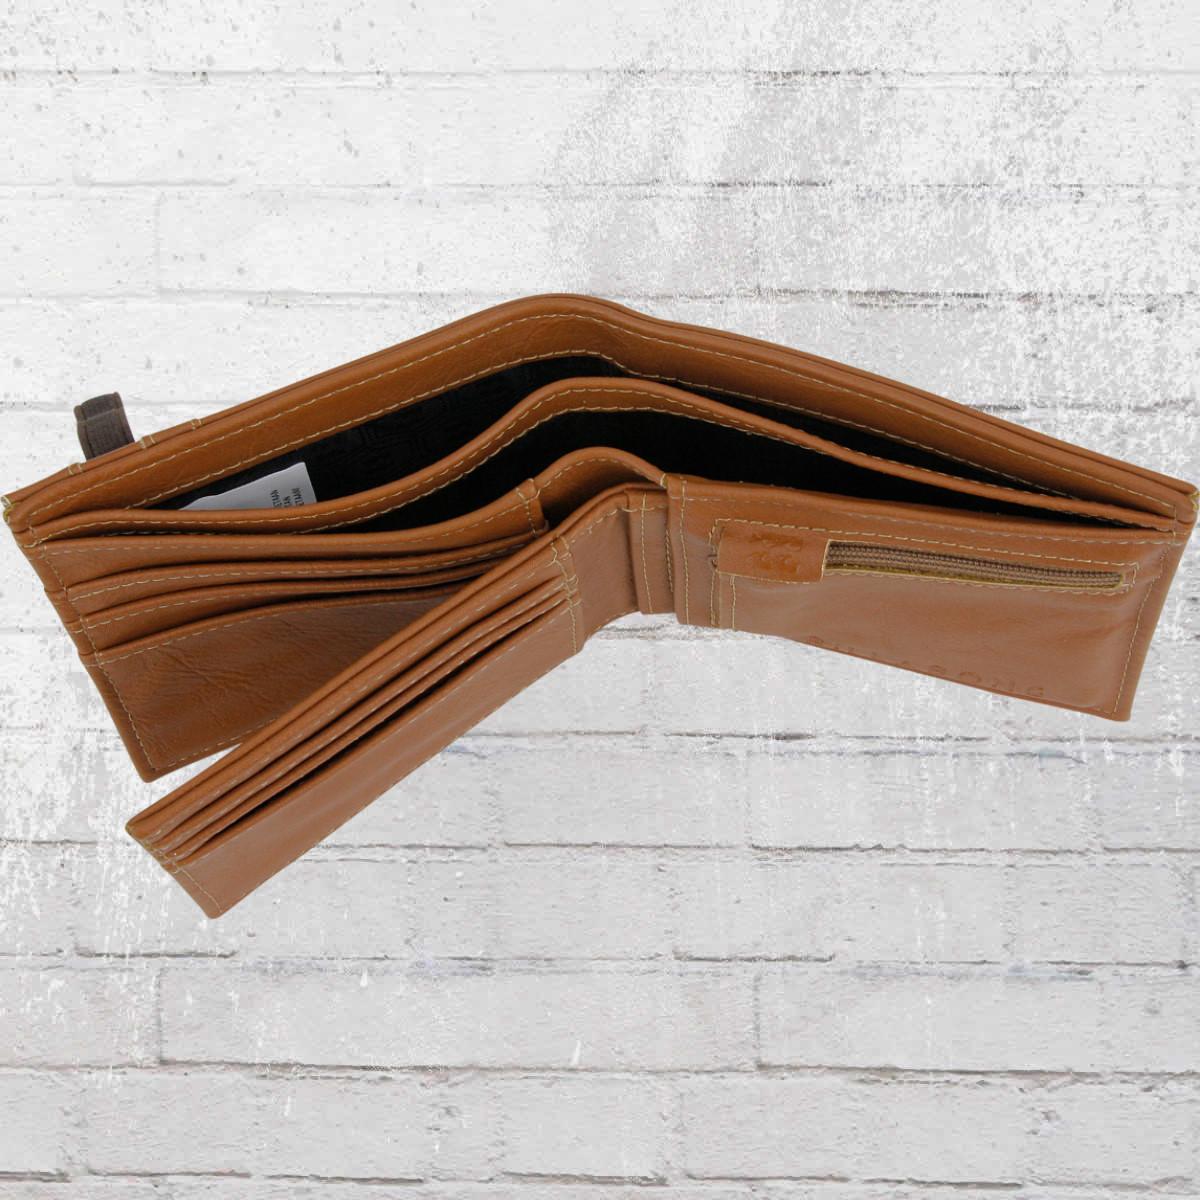 94f205651 Order now | Billabong Locked Wallet tan brown